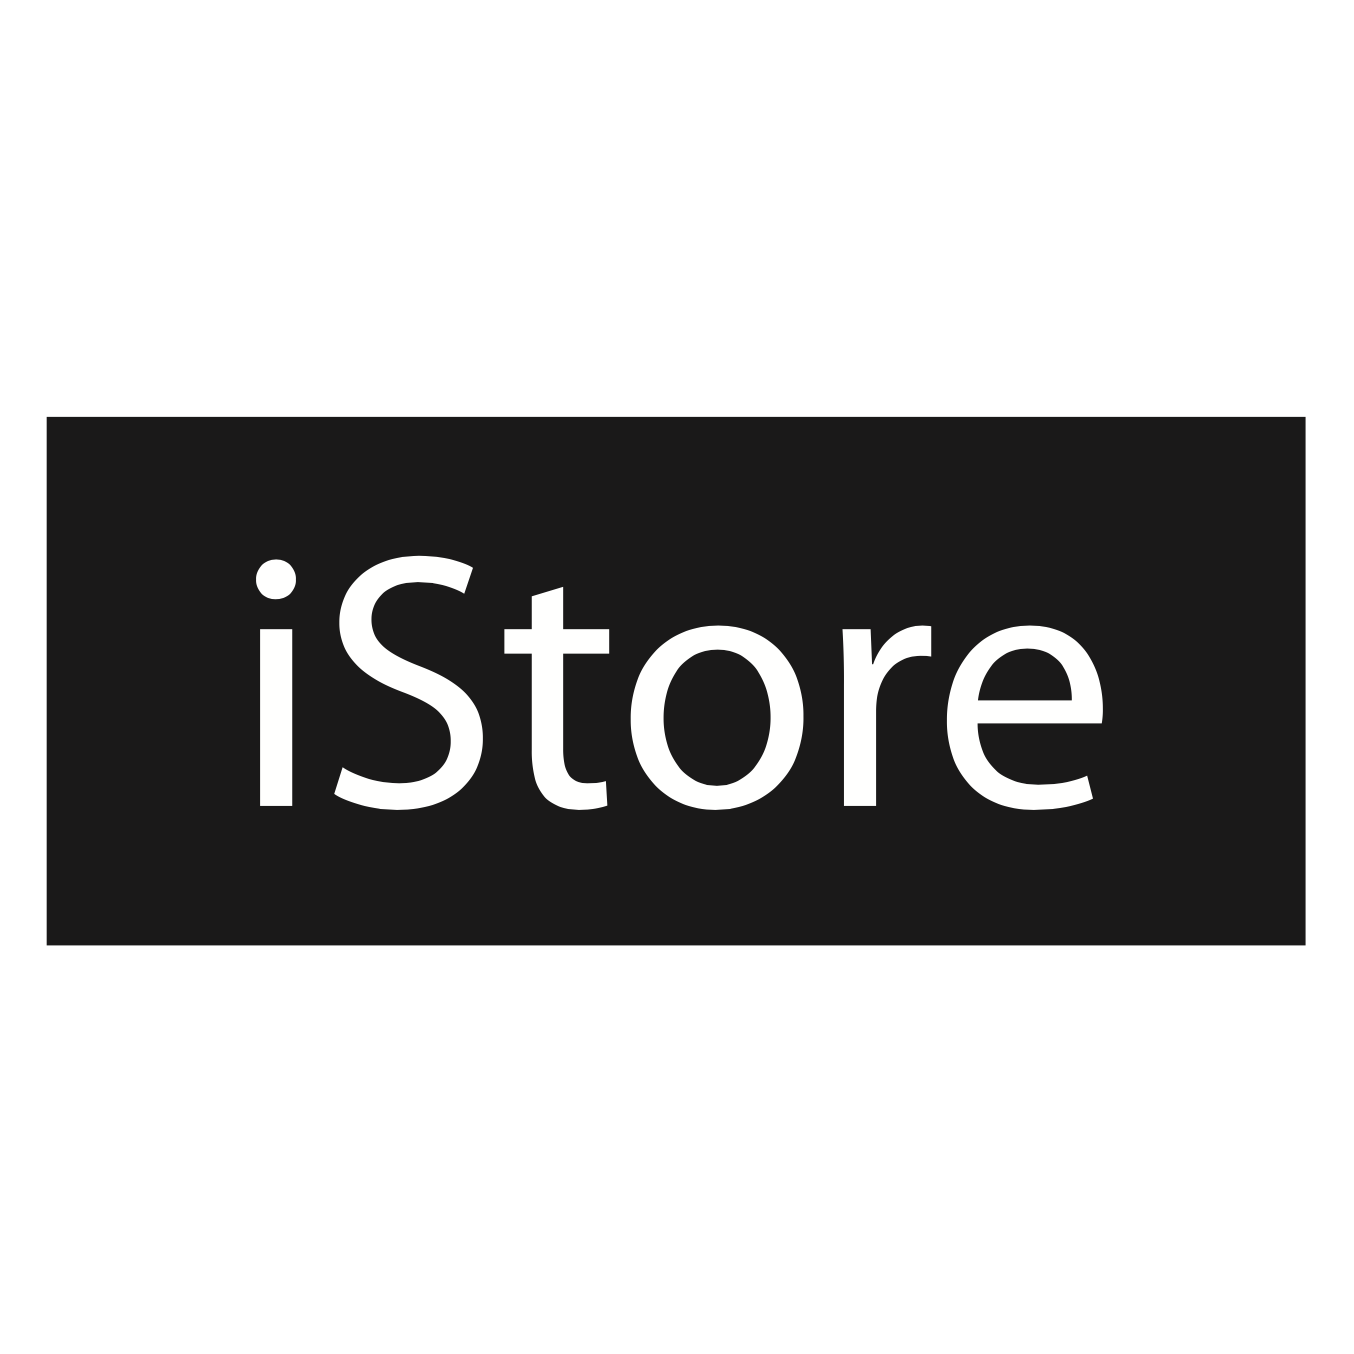 Mac mini 3.0GHz 6-core 8th Gen Intel Core i5 512GB